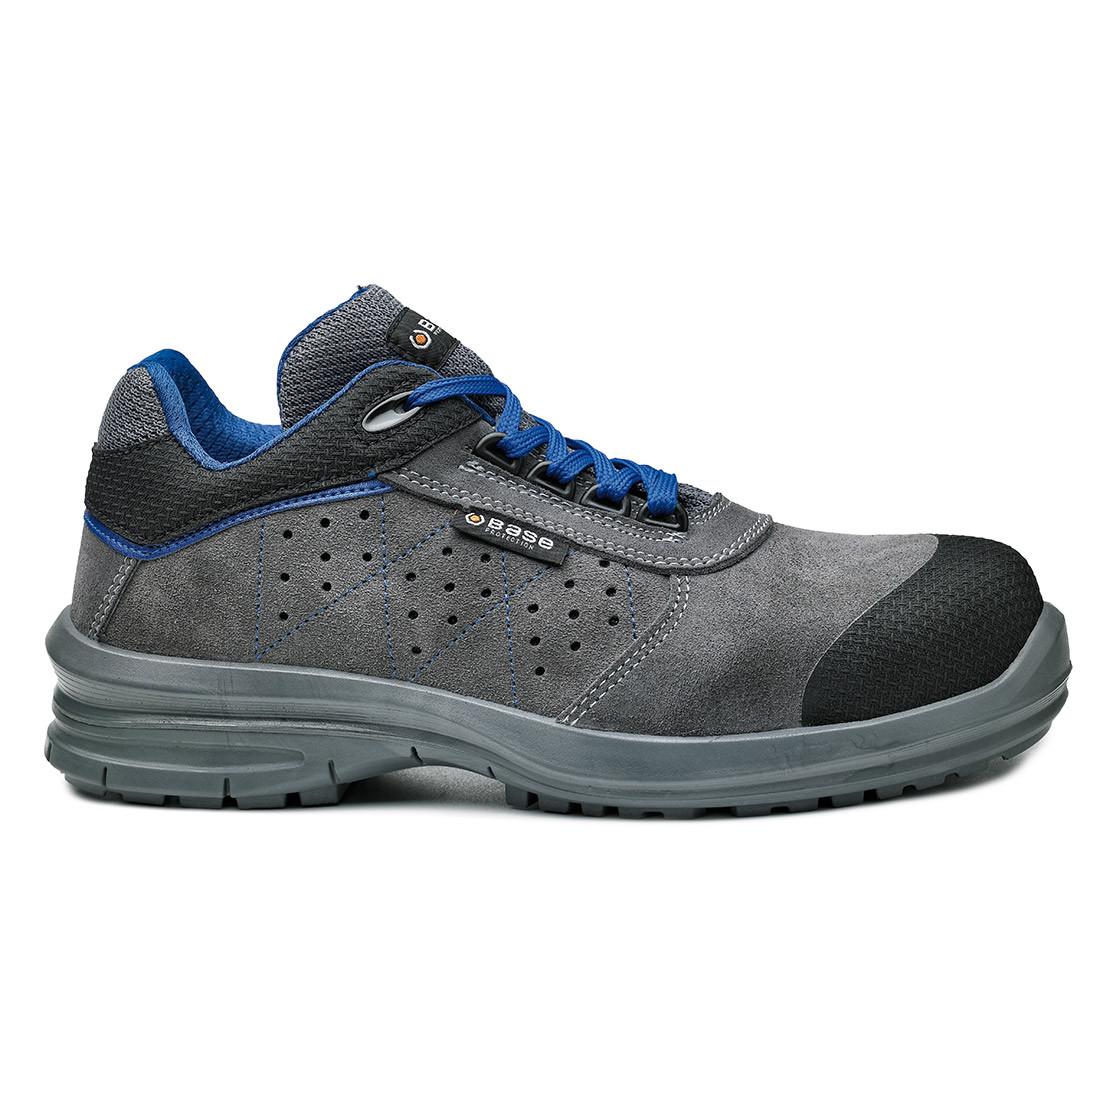 Pantofi Quasar S1P - Incaltaminte de protectie